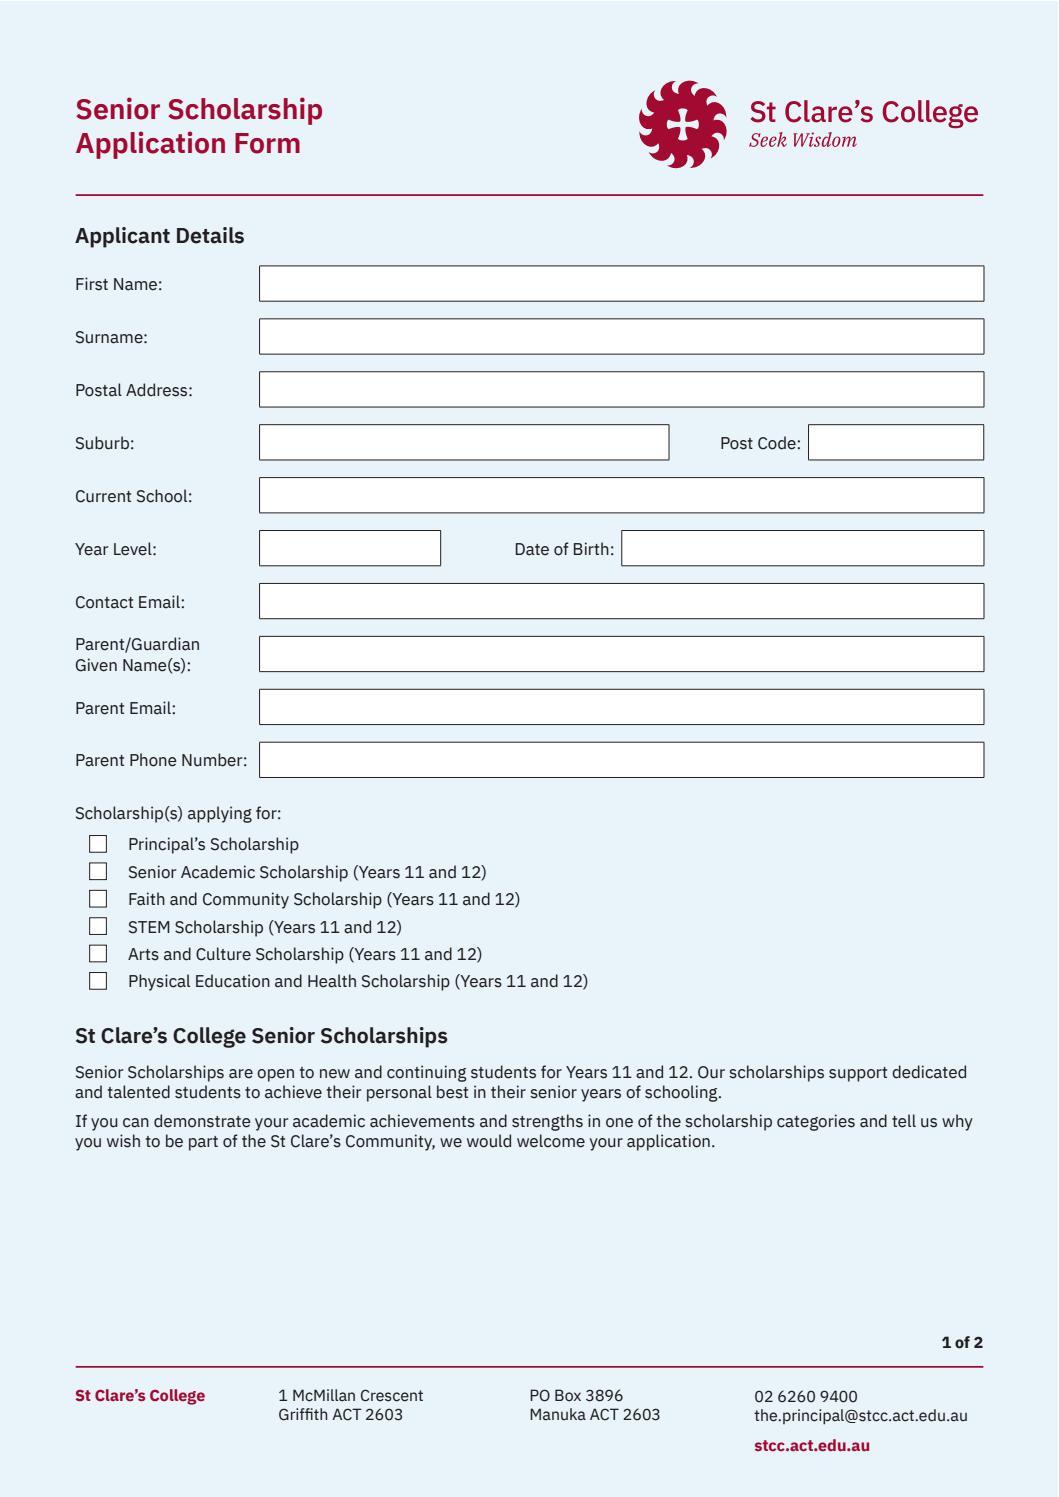 Senior Scholarship Application Form